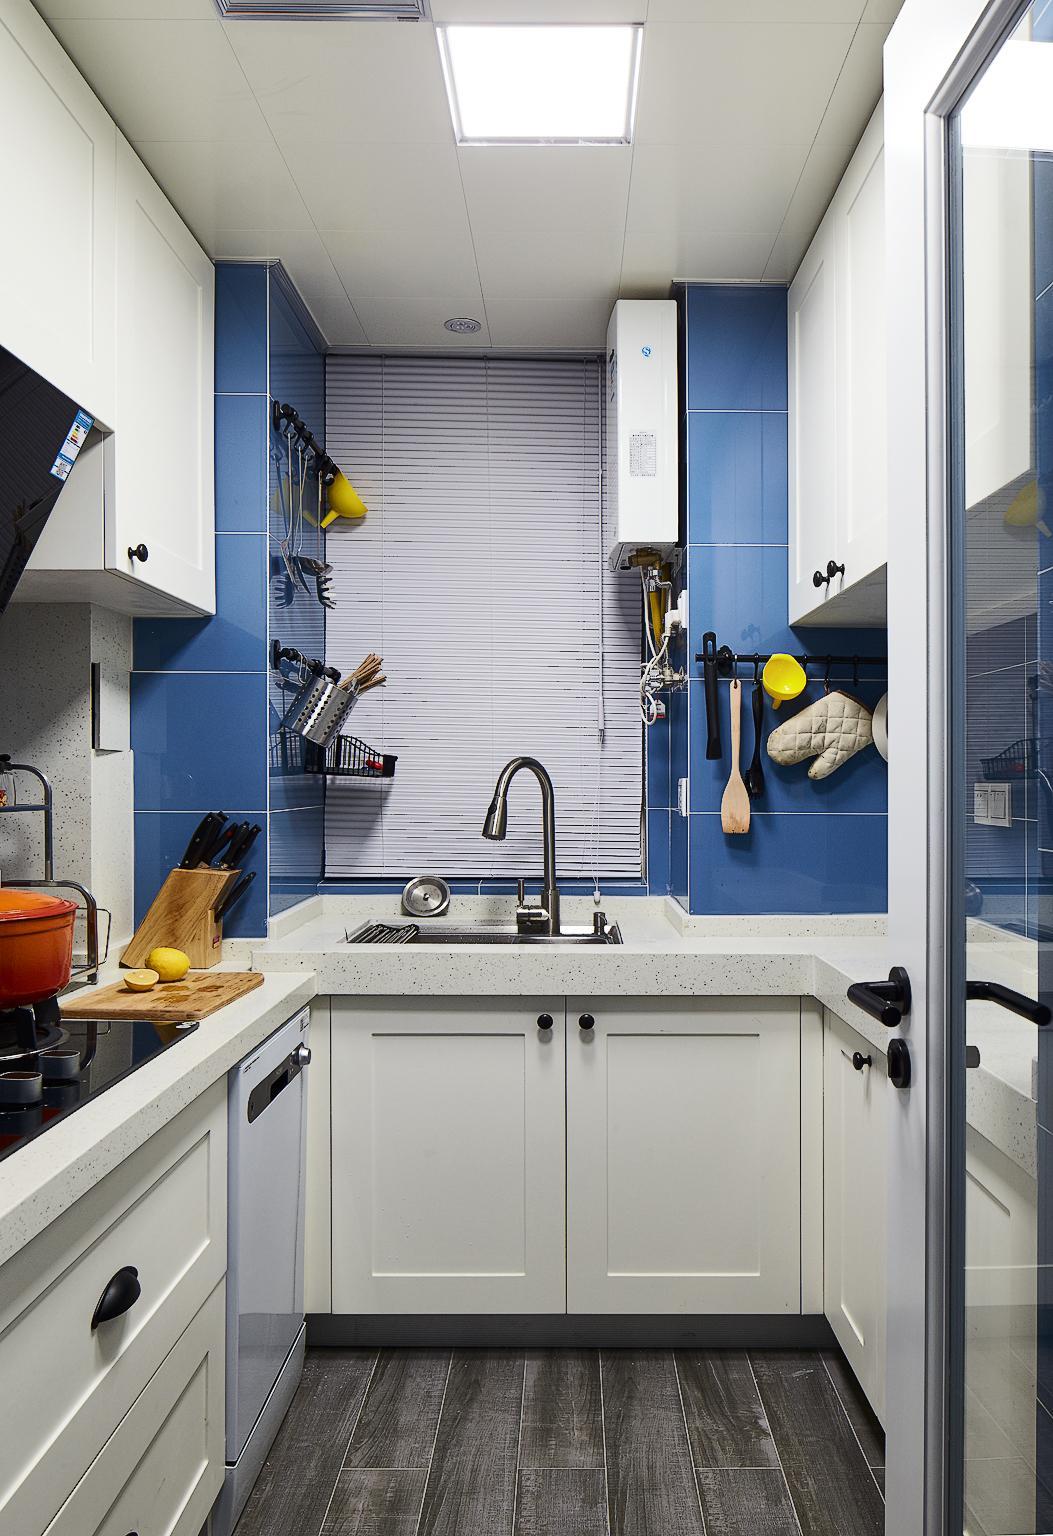 repaint kitchen cabinets assembled 橱柜材质以及选购方式 知乎